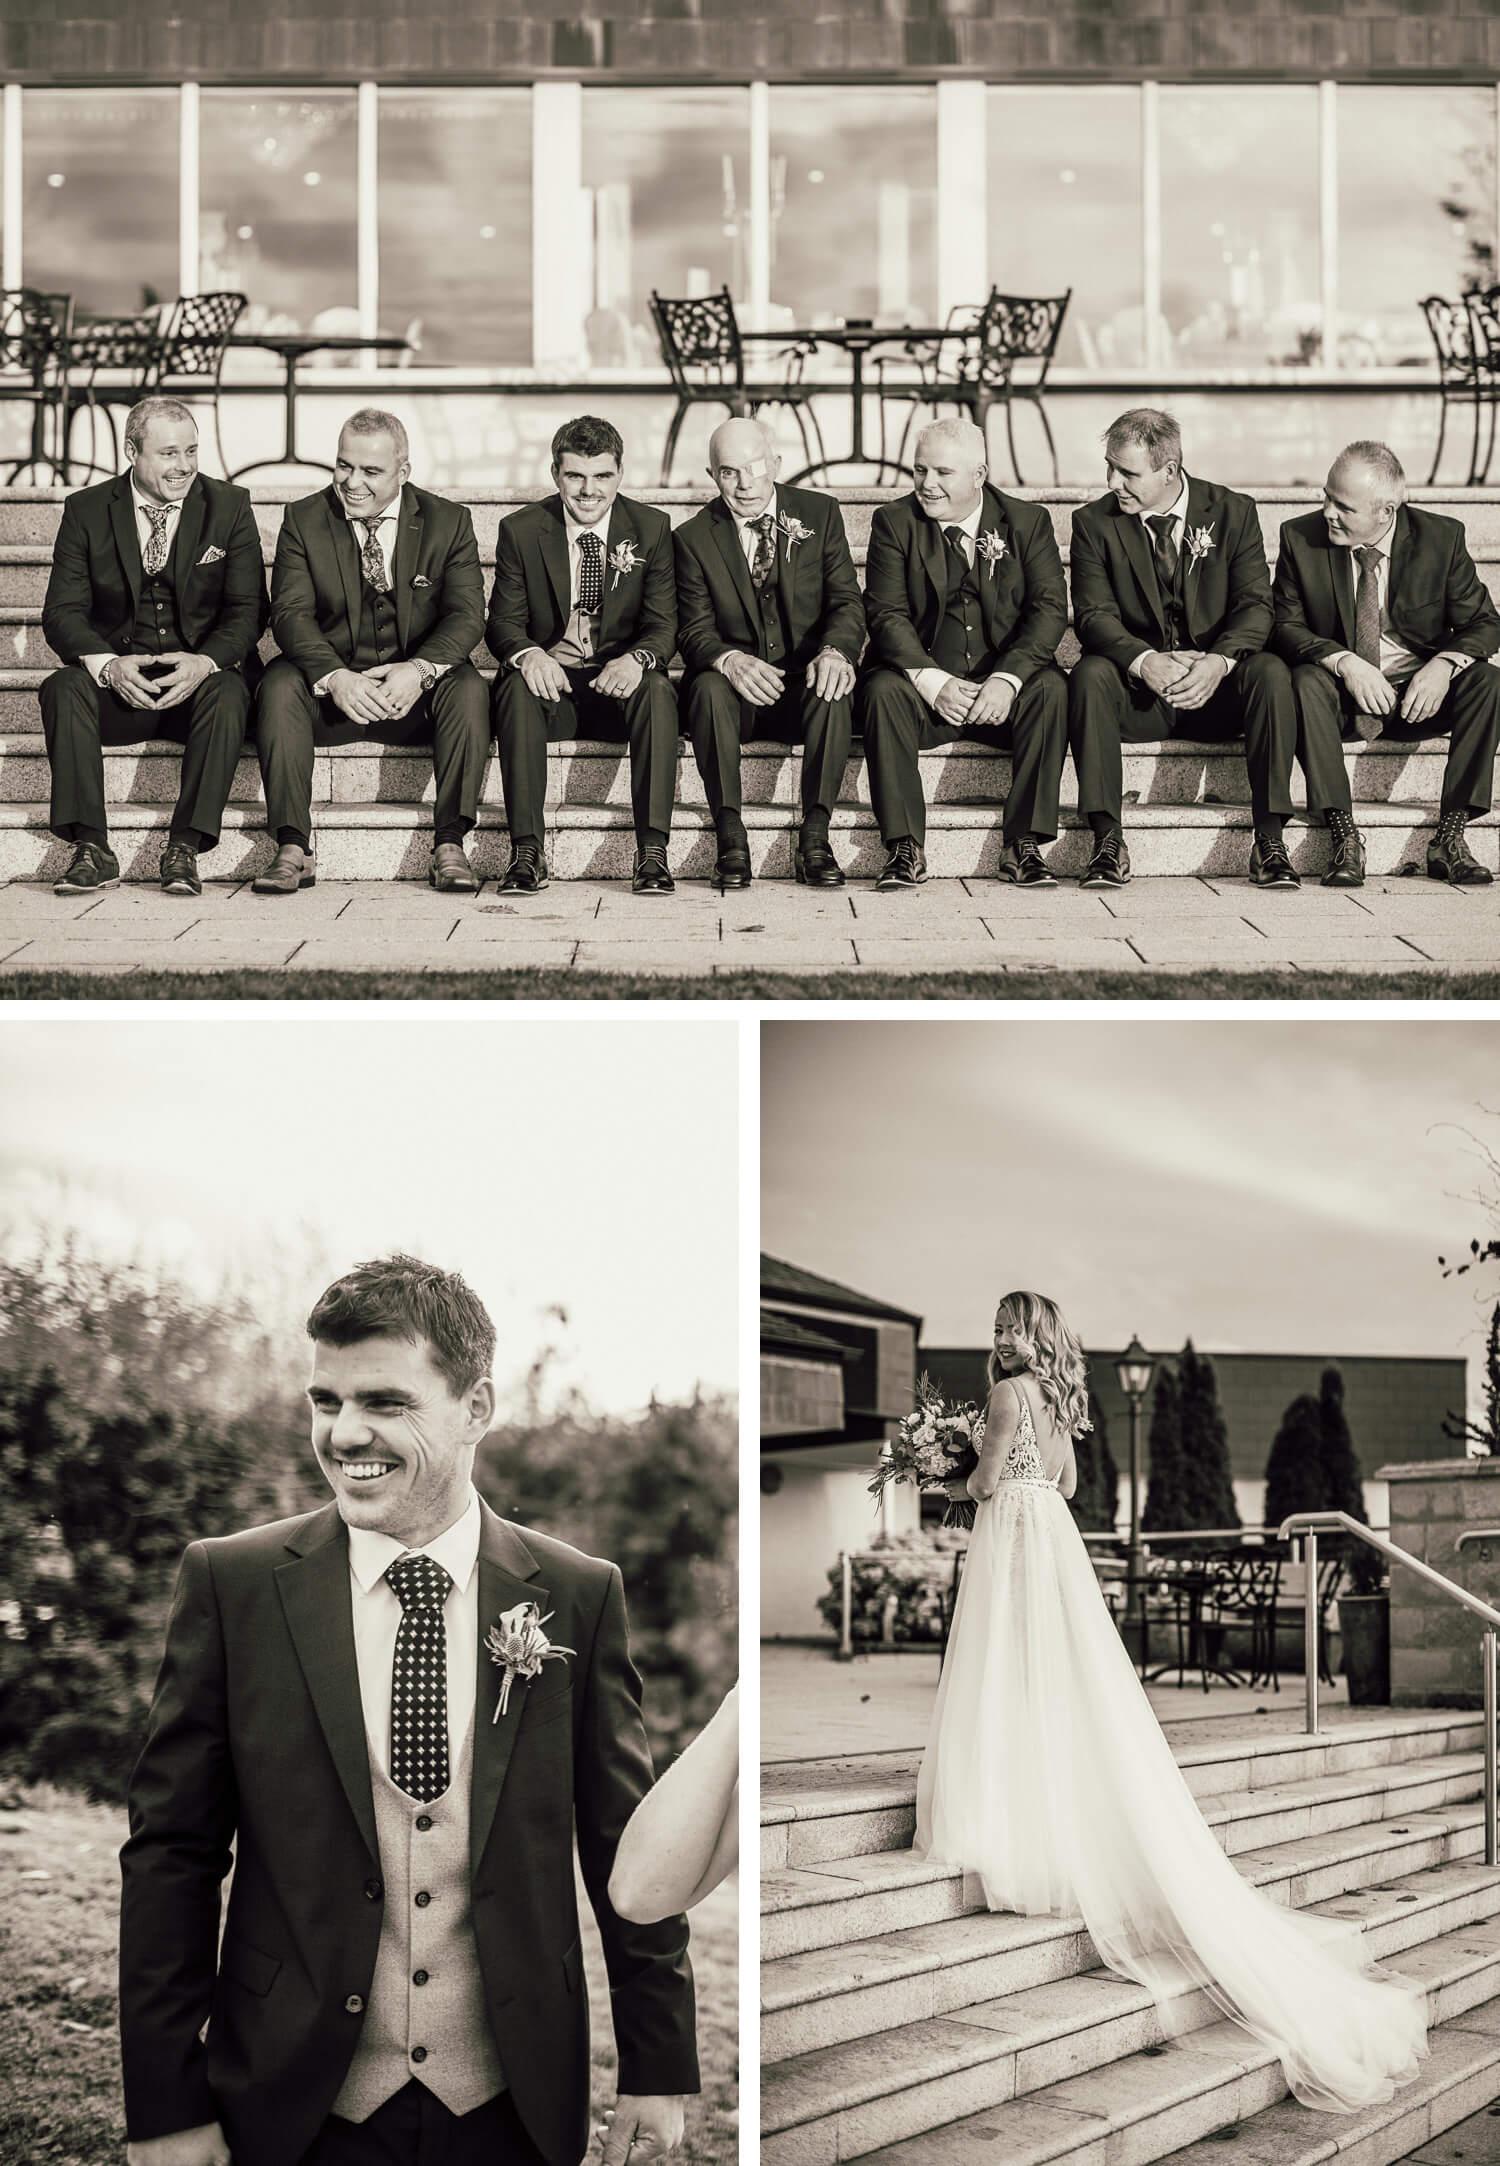 darren-fitzpatrick-photography- killyhevlin-wedding 28